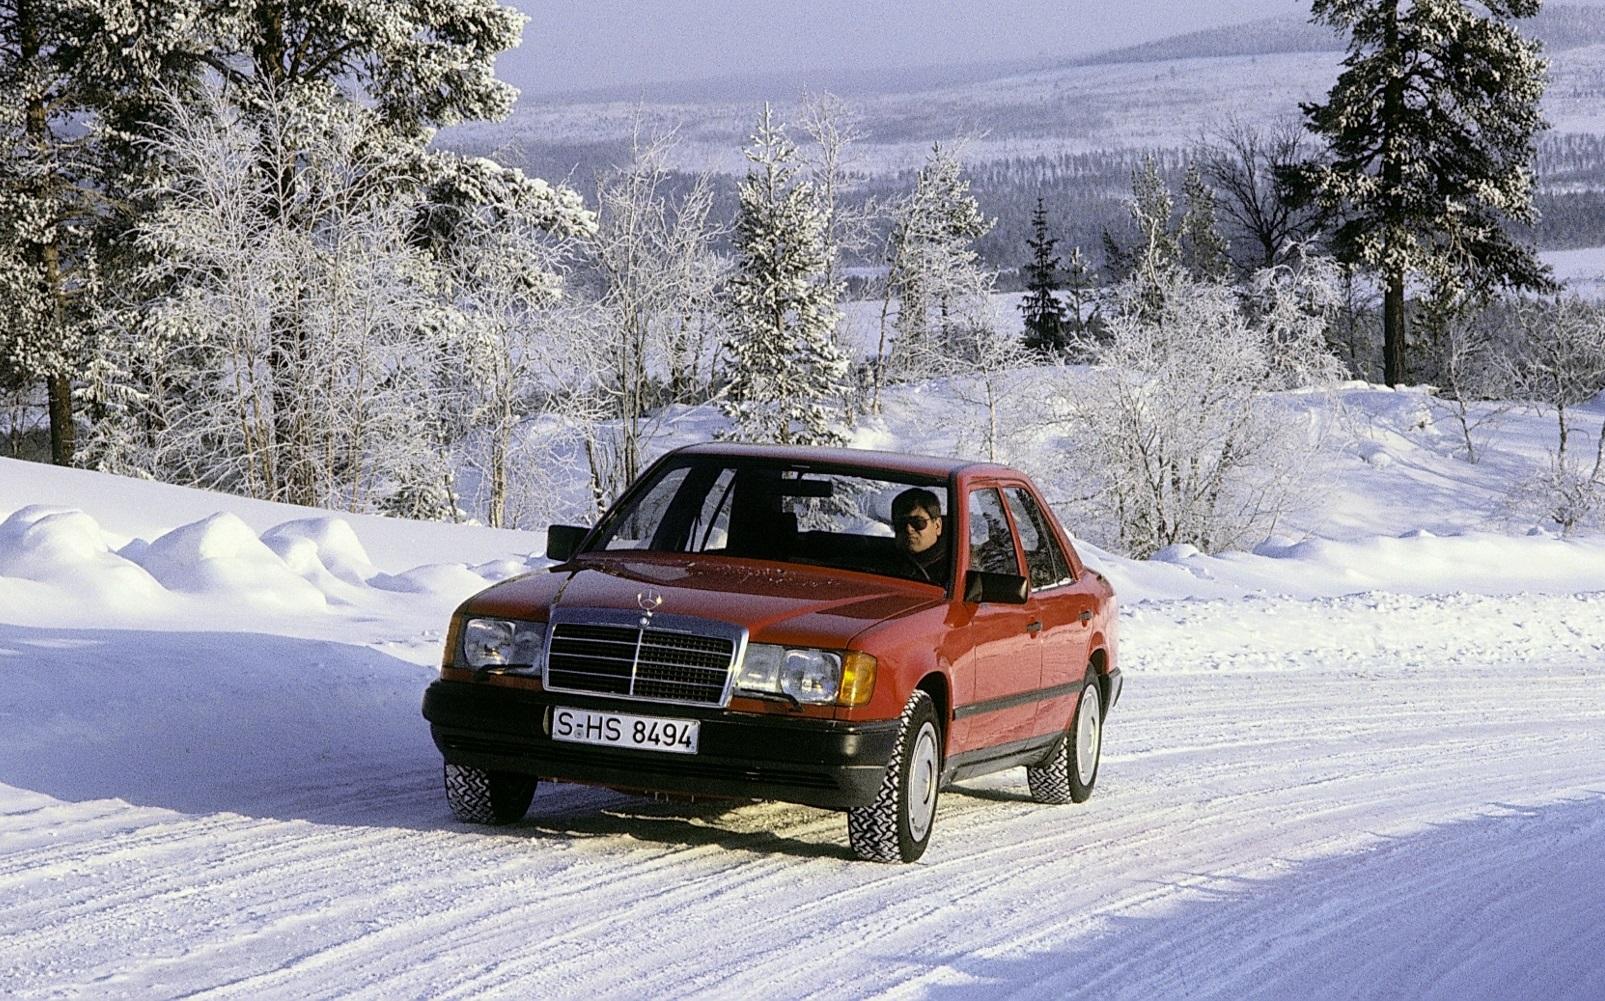 Návrat na autosalón IAA 1985: Mercedes predstavil nové systémy ASD, ASR a 4MATIC